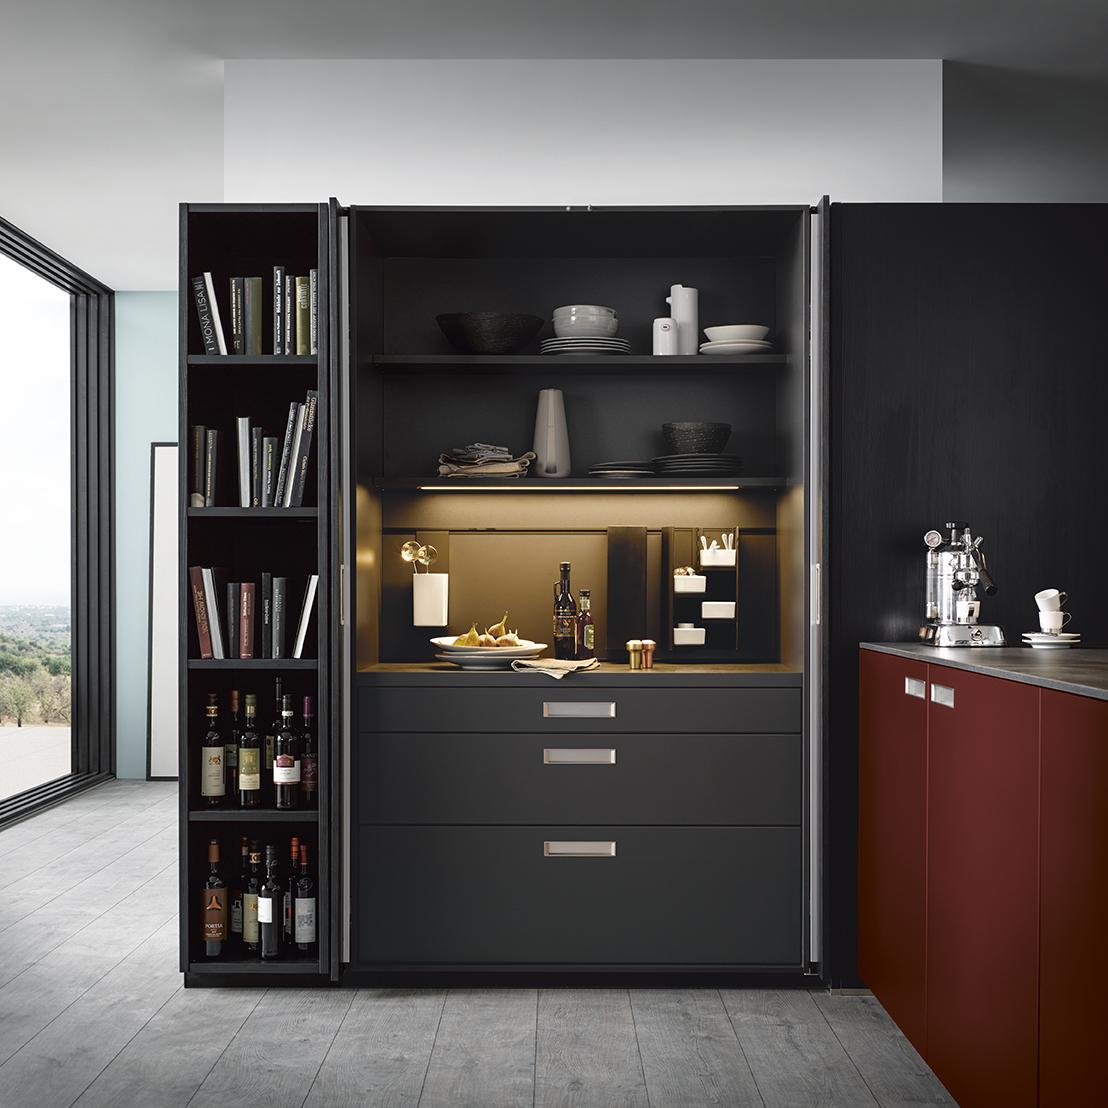 rangement pour cuisine moderne ultra chic et moderne